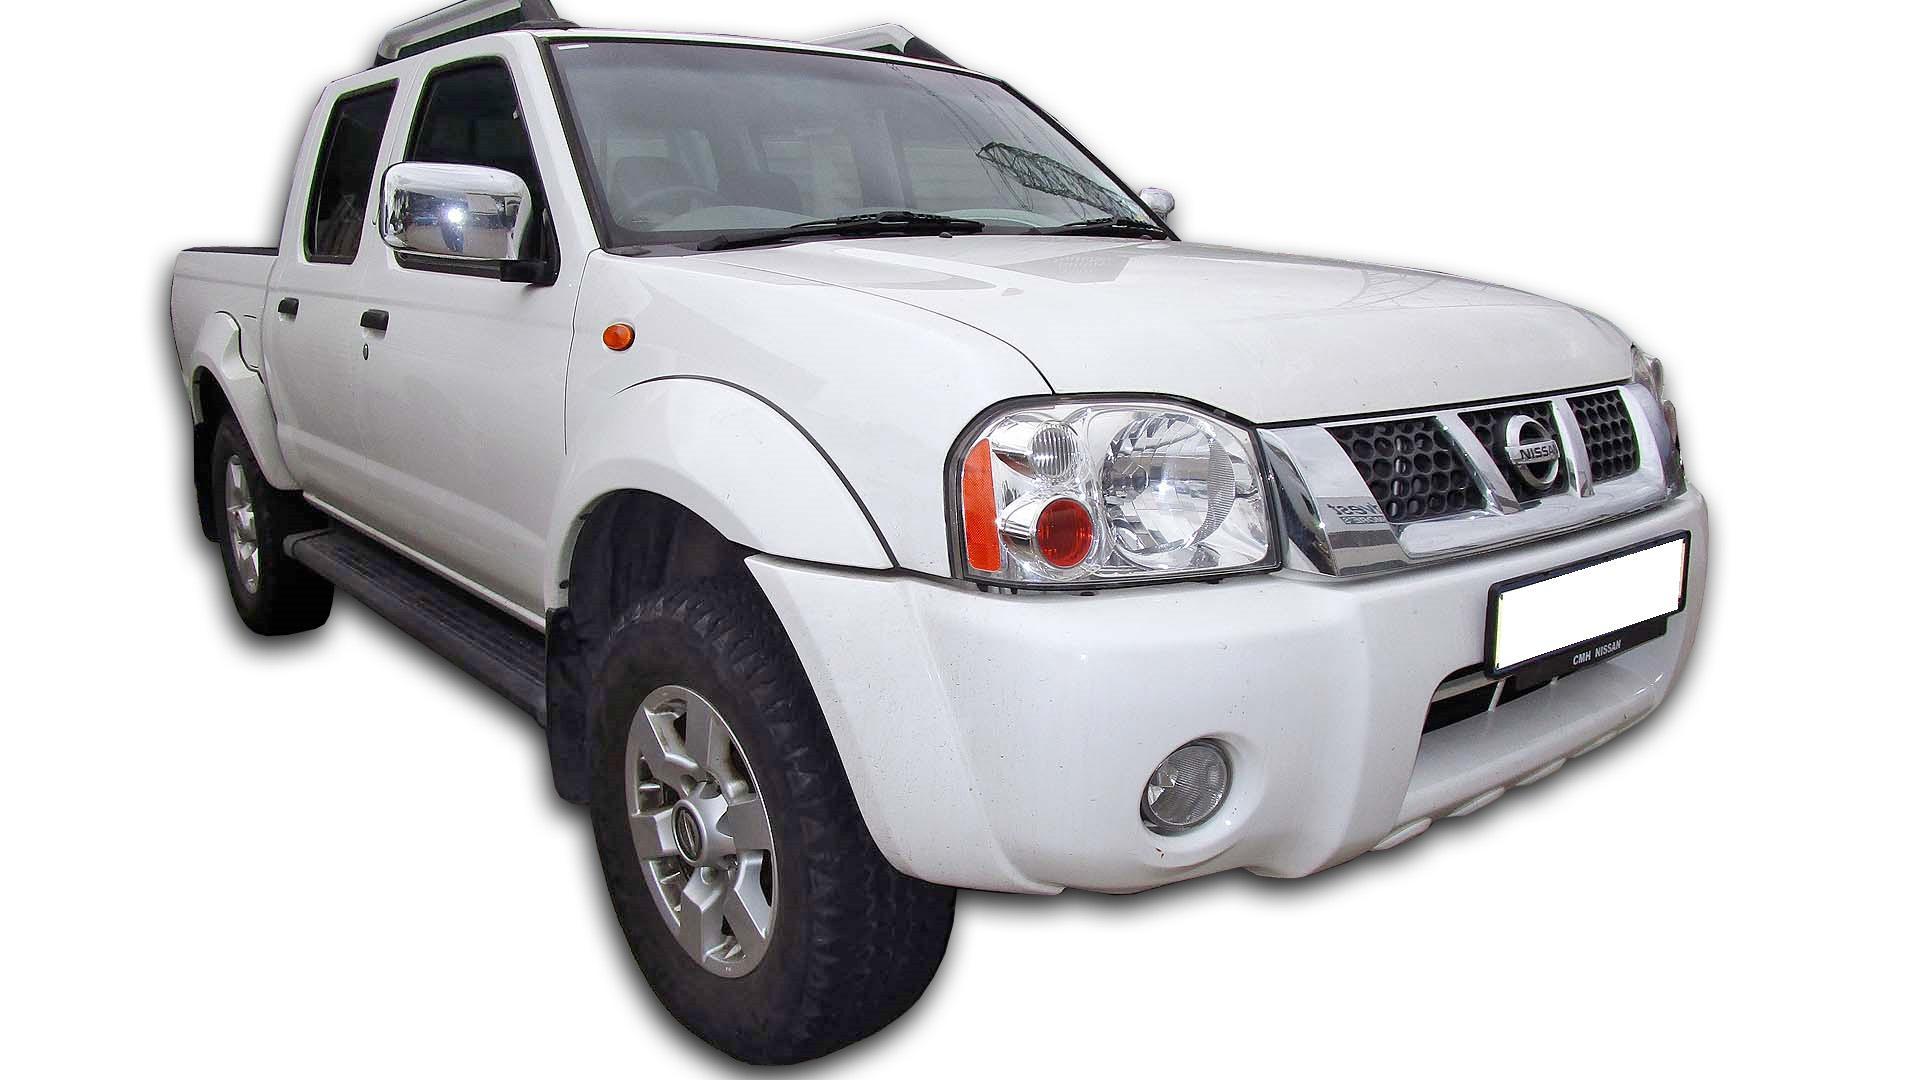 Nissan Hardbody NP300 2.4 I